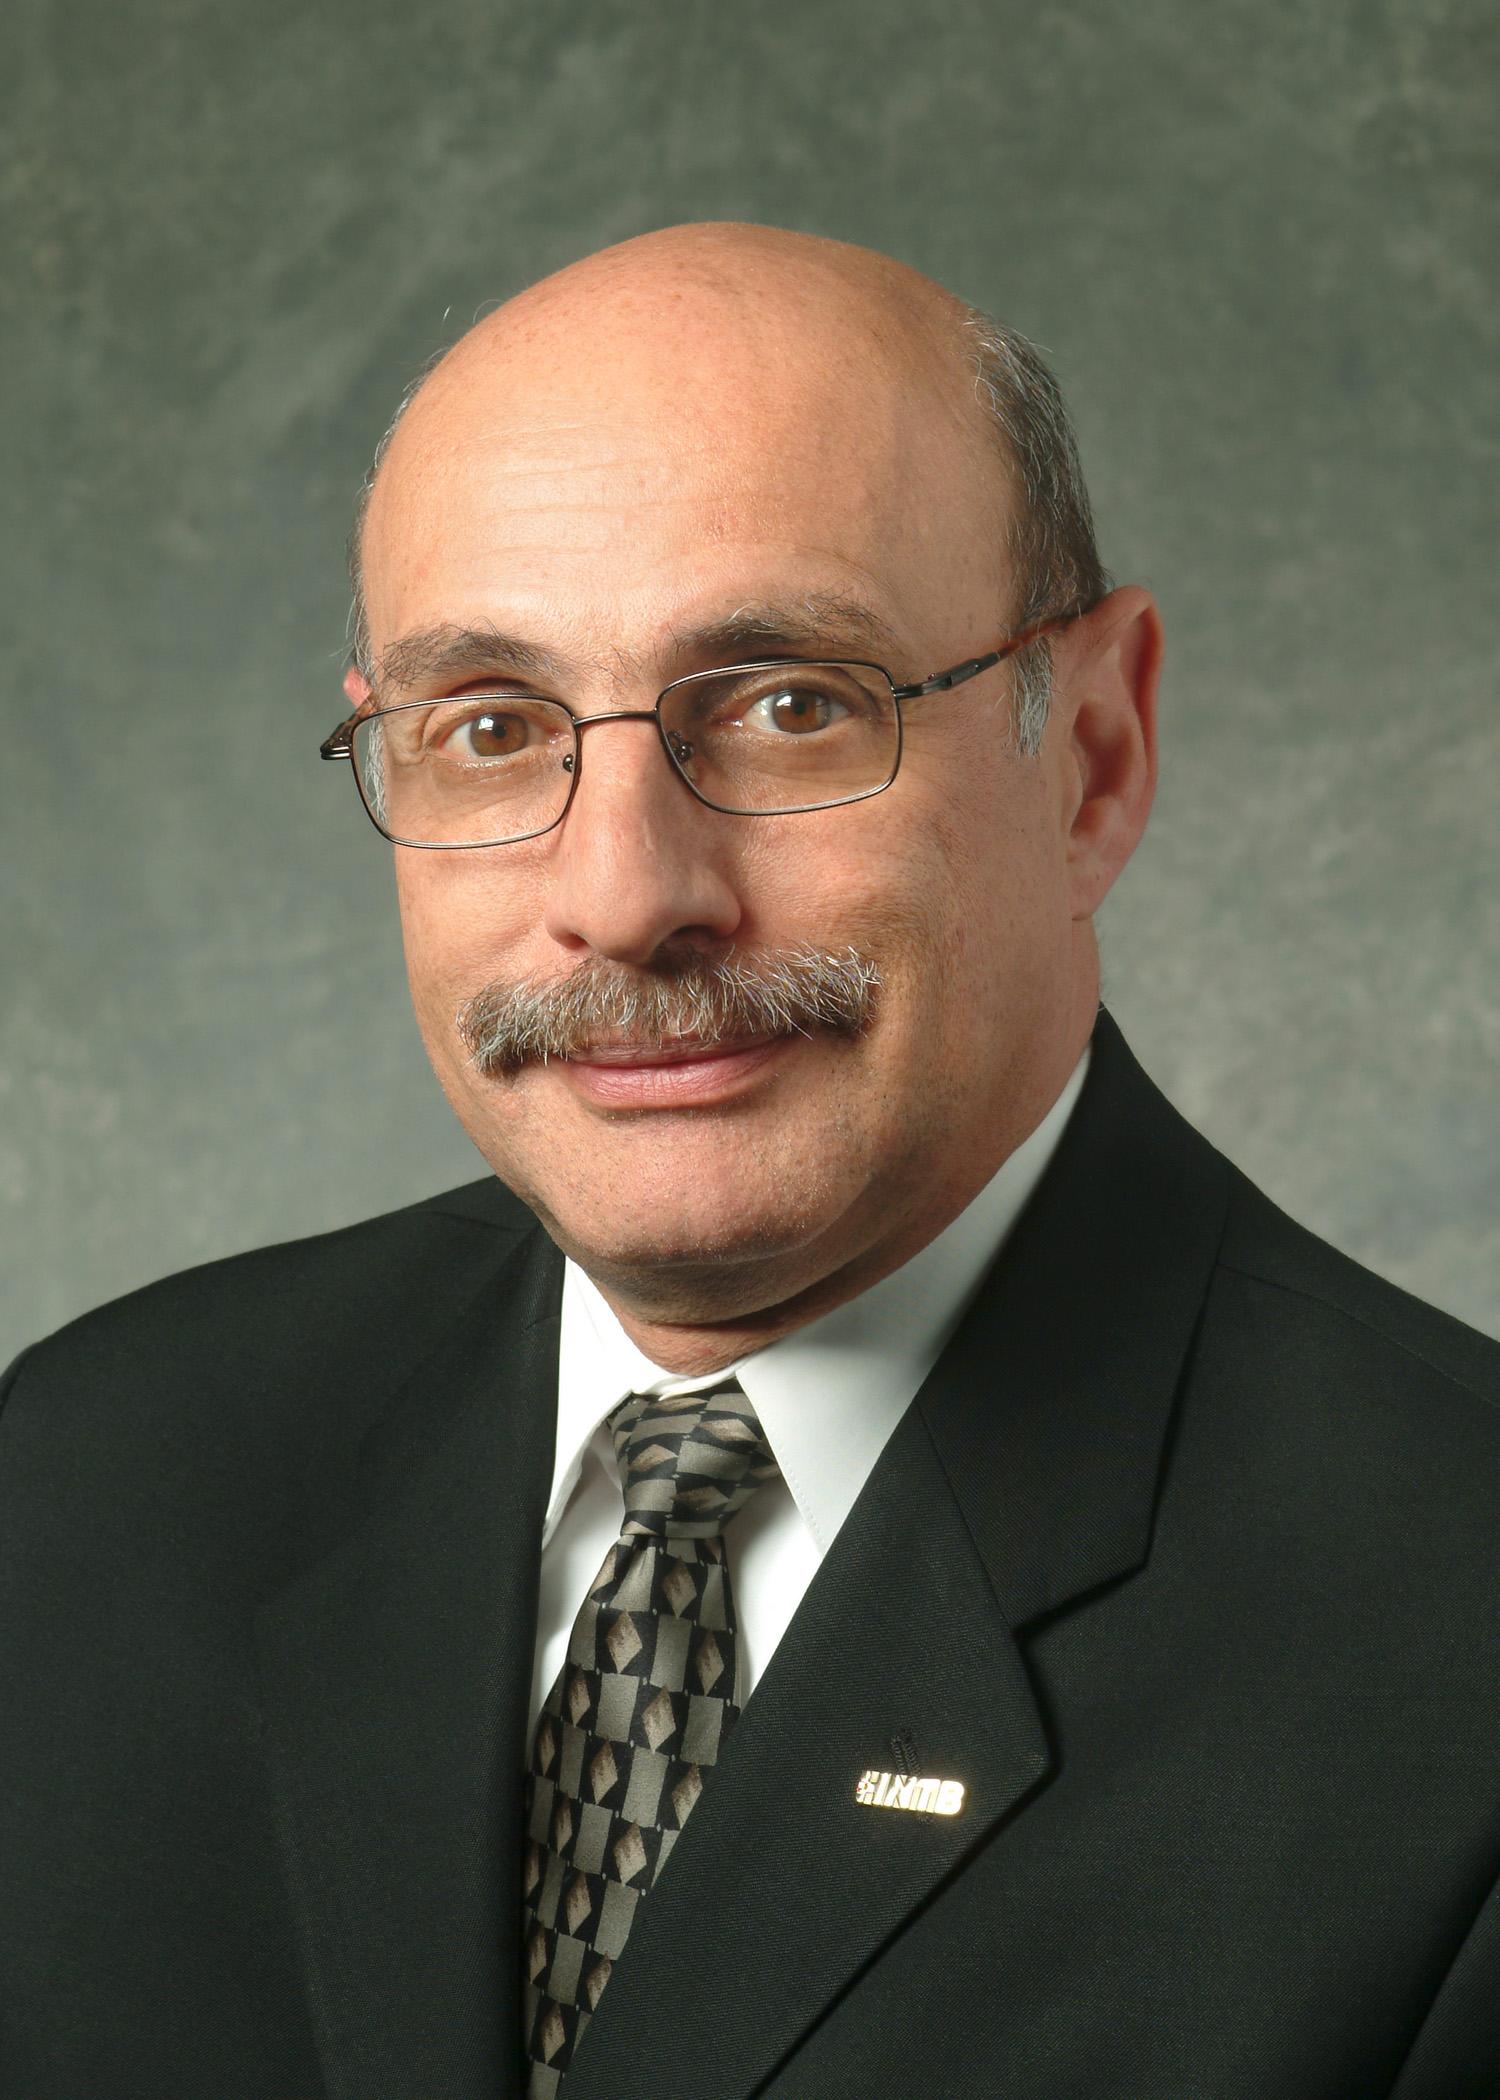 Paul Yarossi, Executive Vice President, HNTB